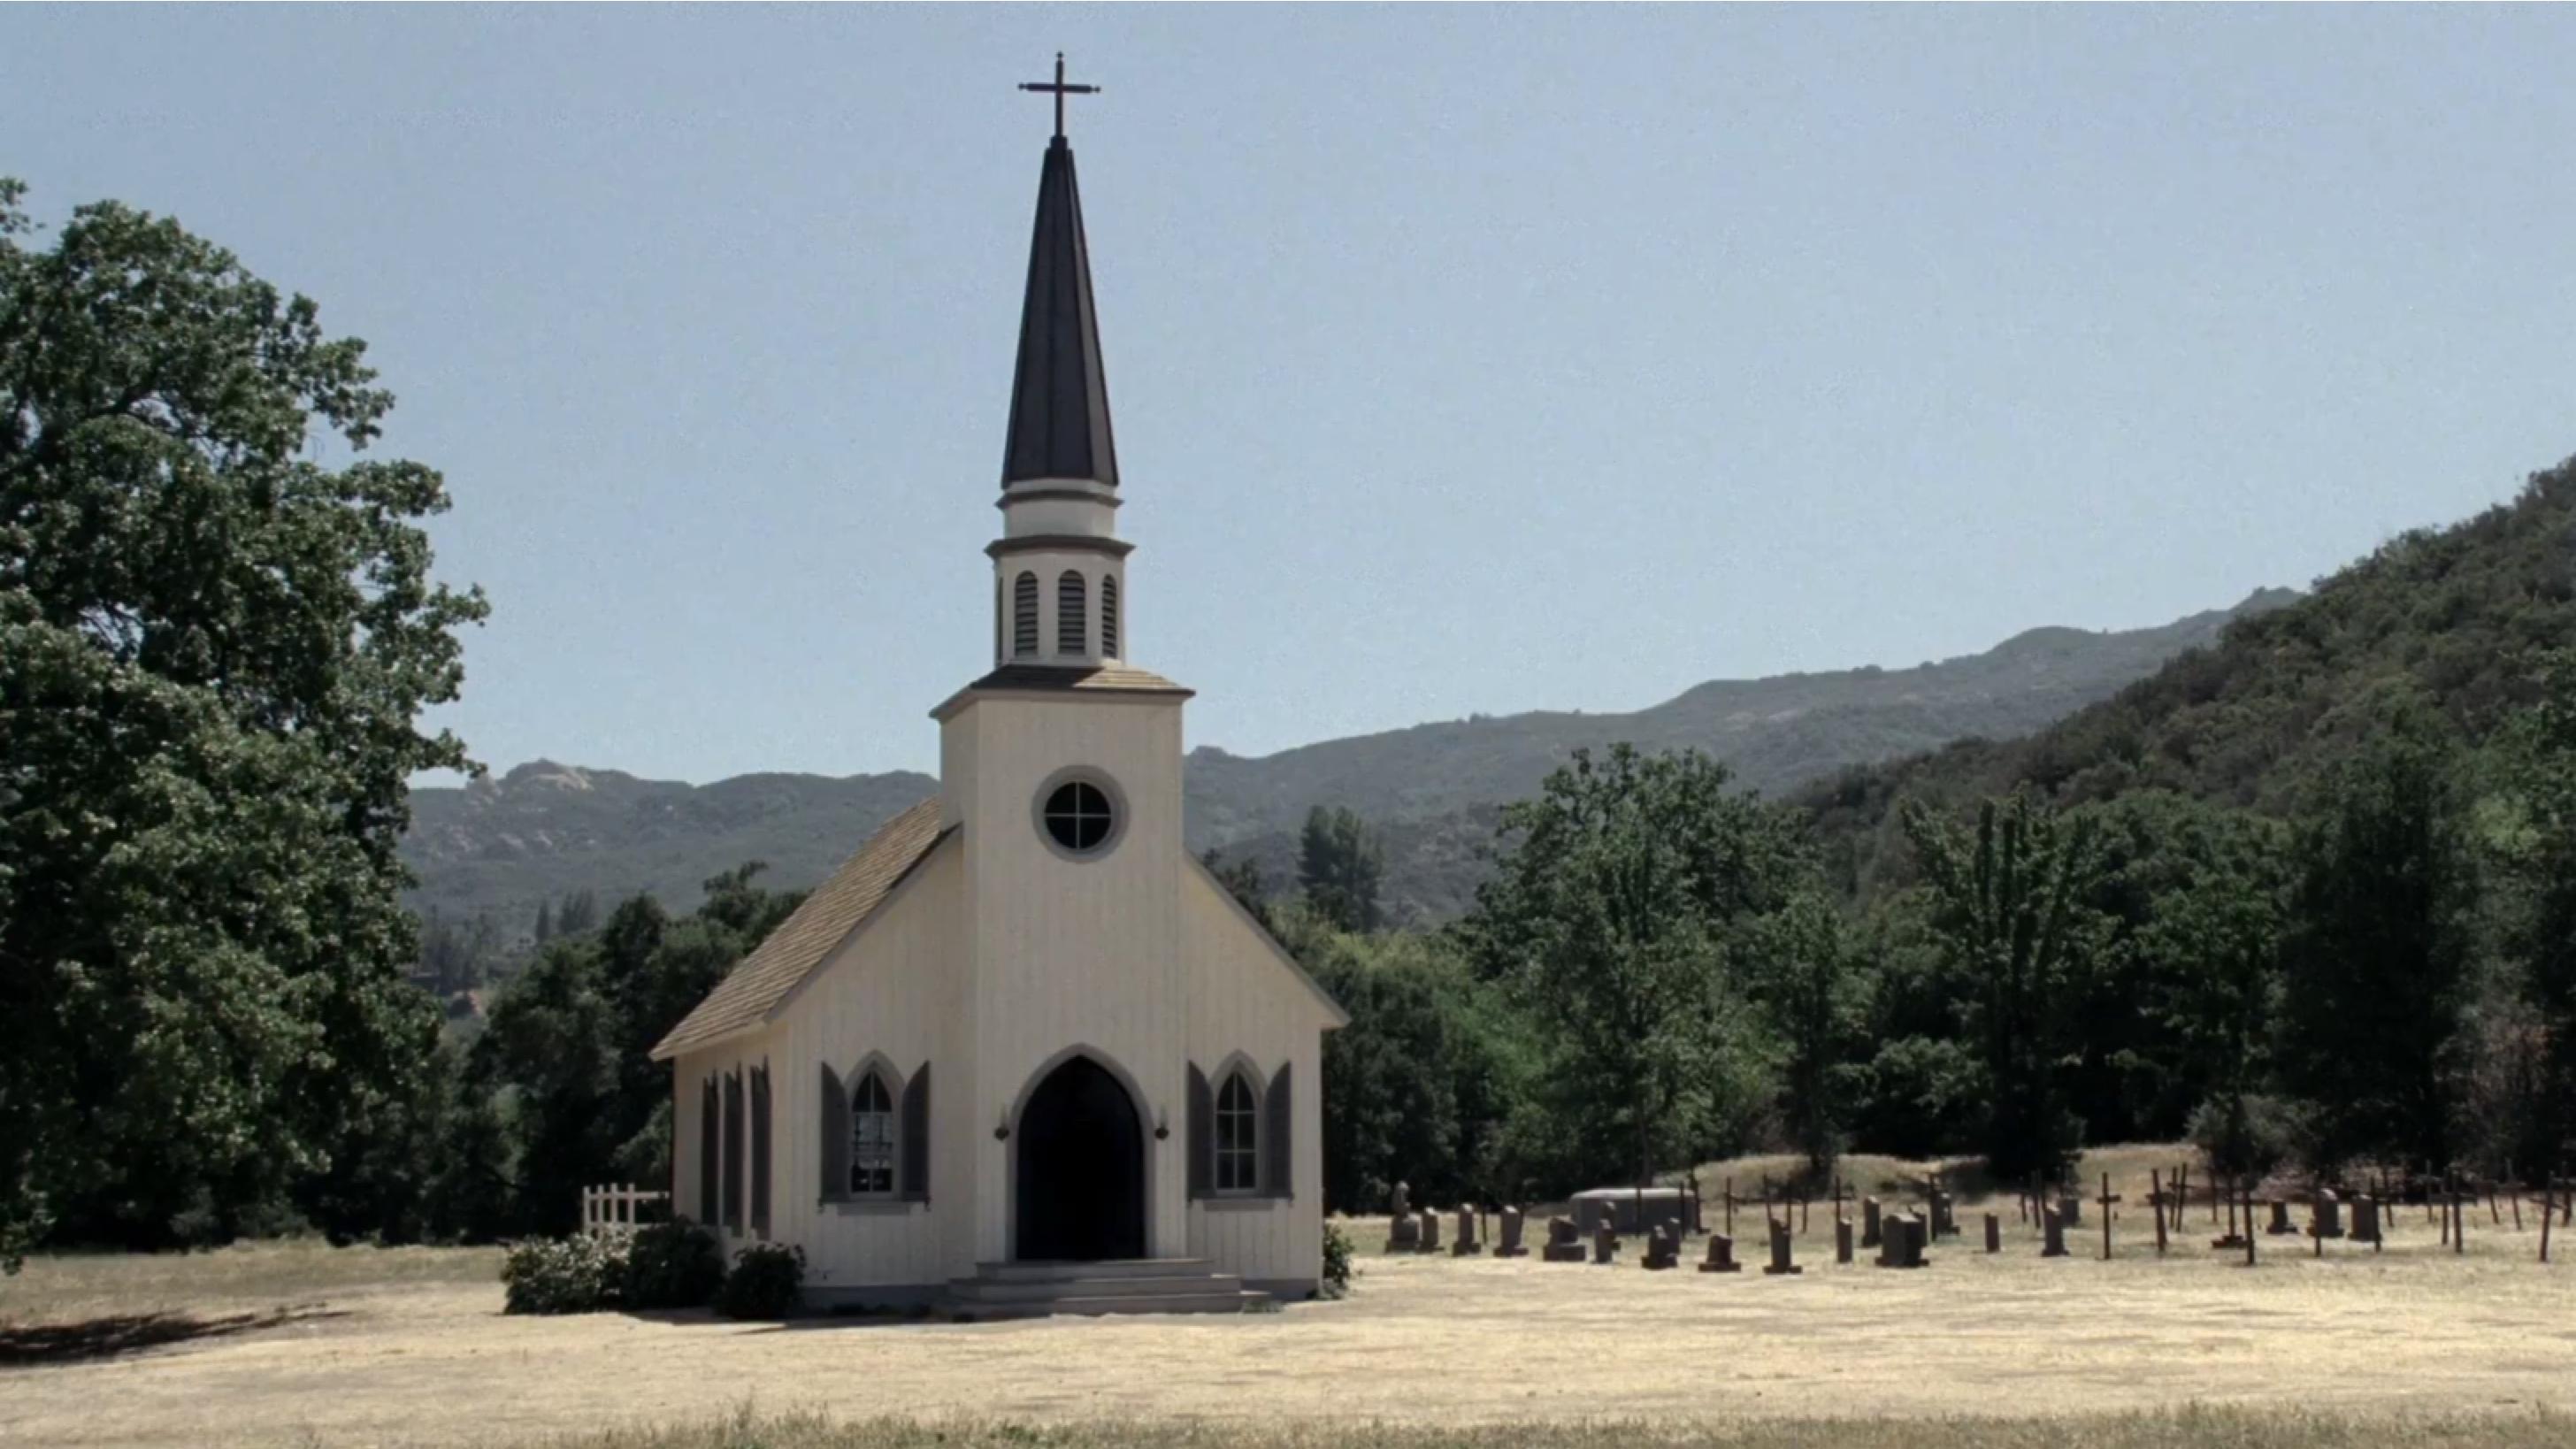 The church steeple in westworld what does it mean westworld church altavistaventures Images